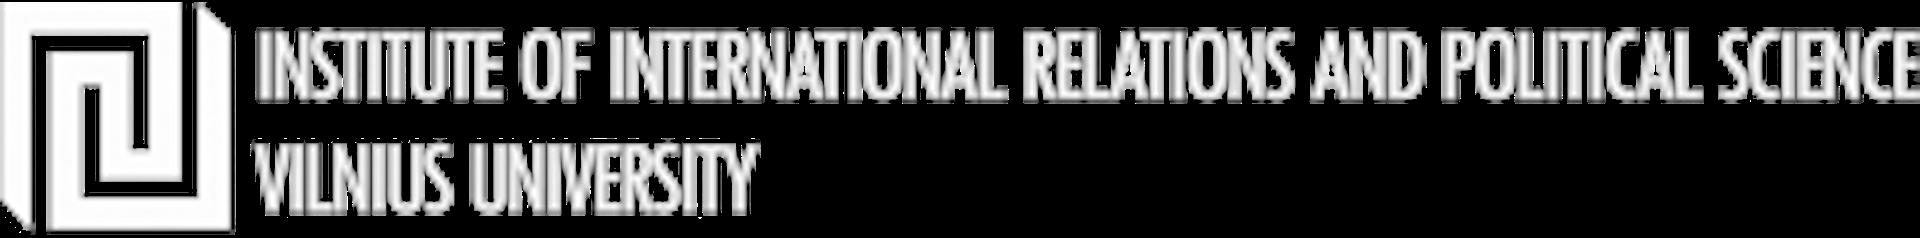 Logo 1399889998.png?ixlib=rb 1.1